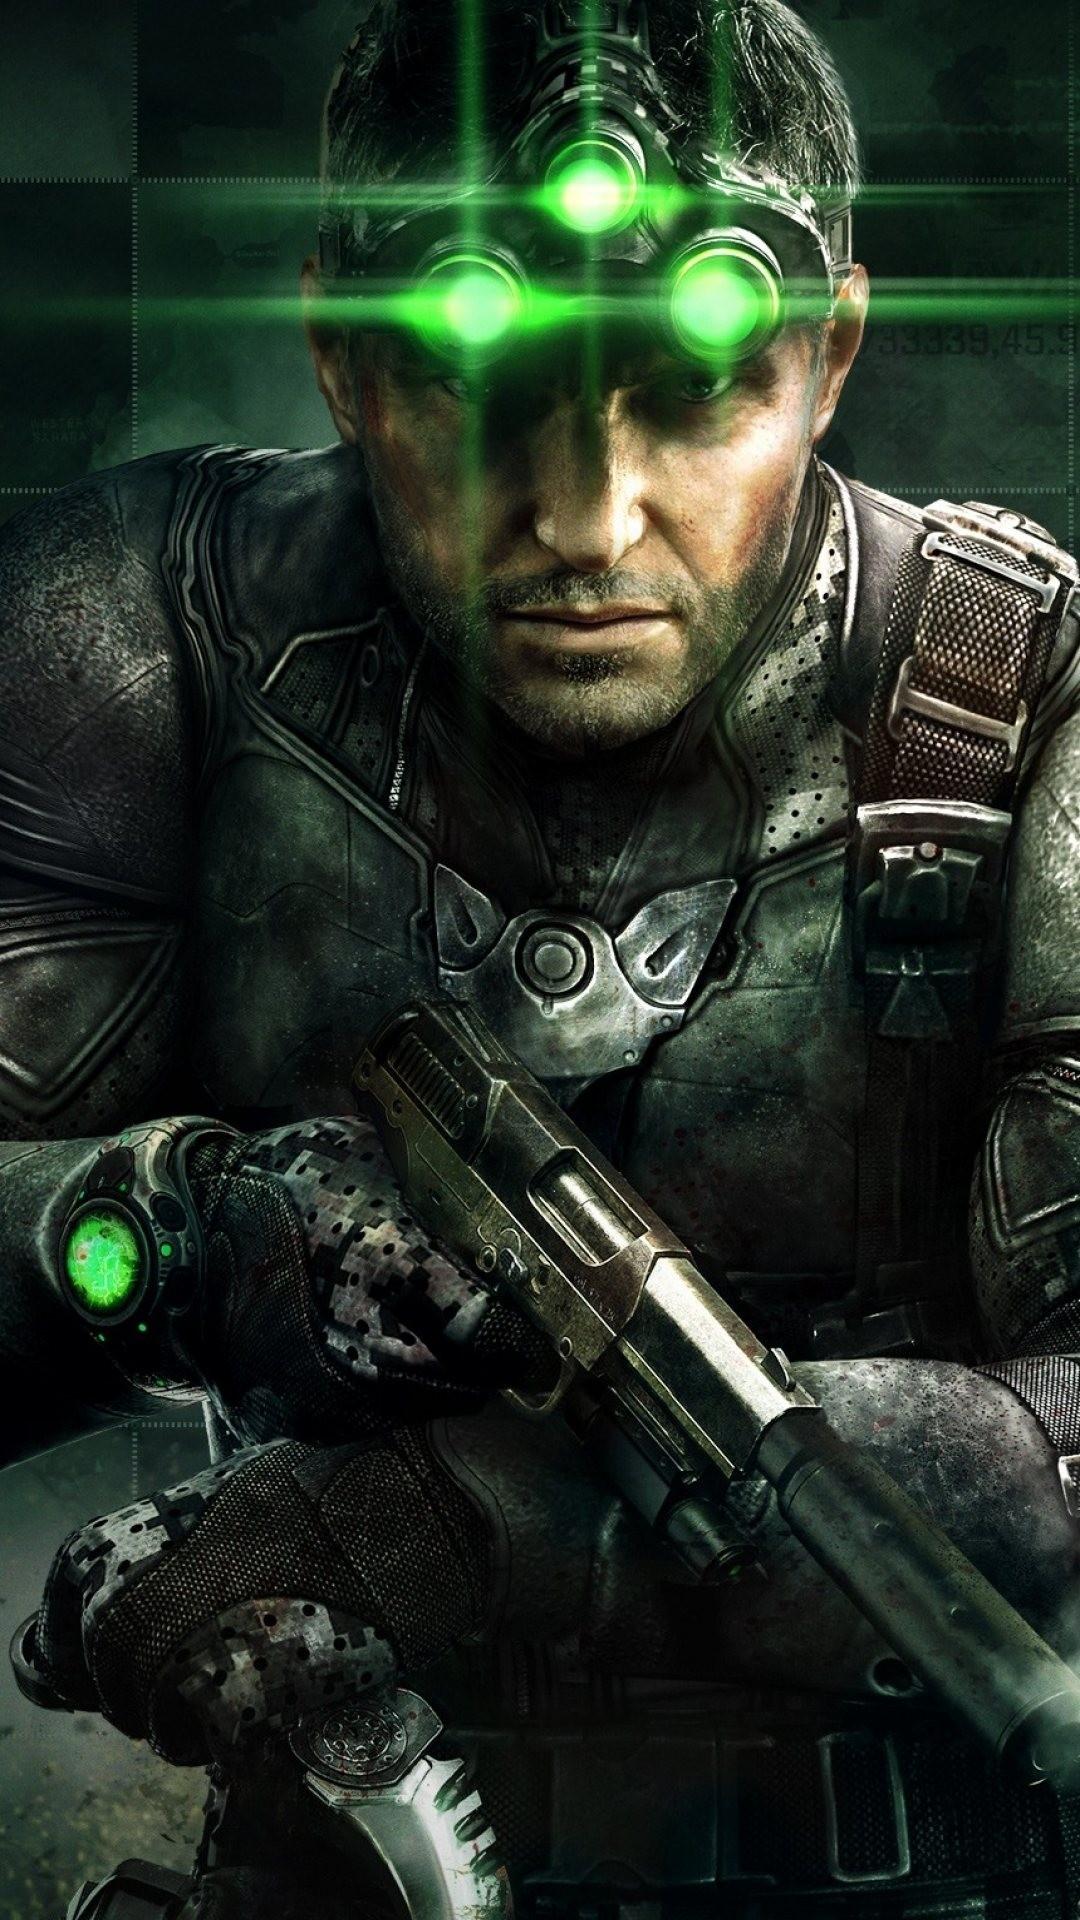 splinter cell blacklist full game free download